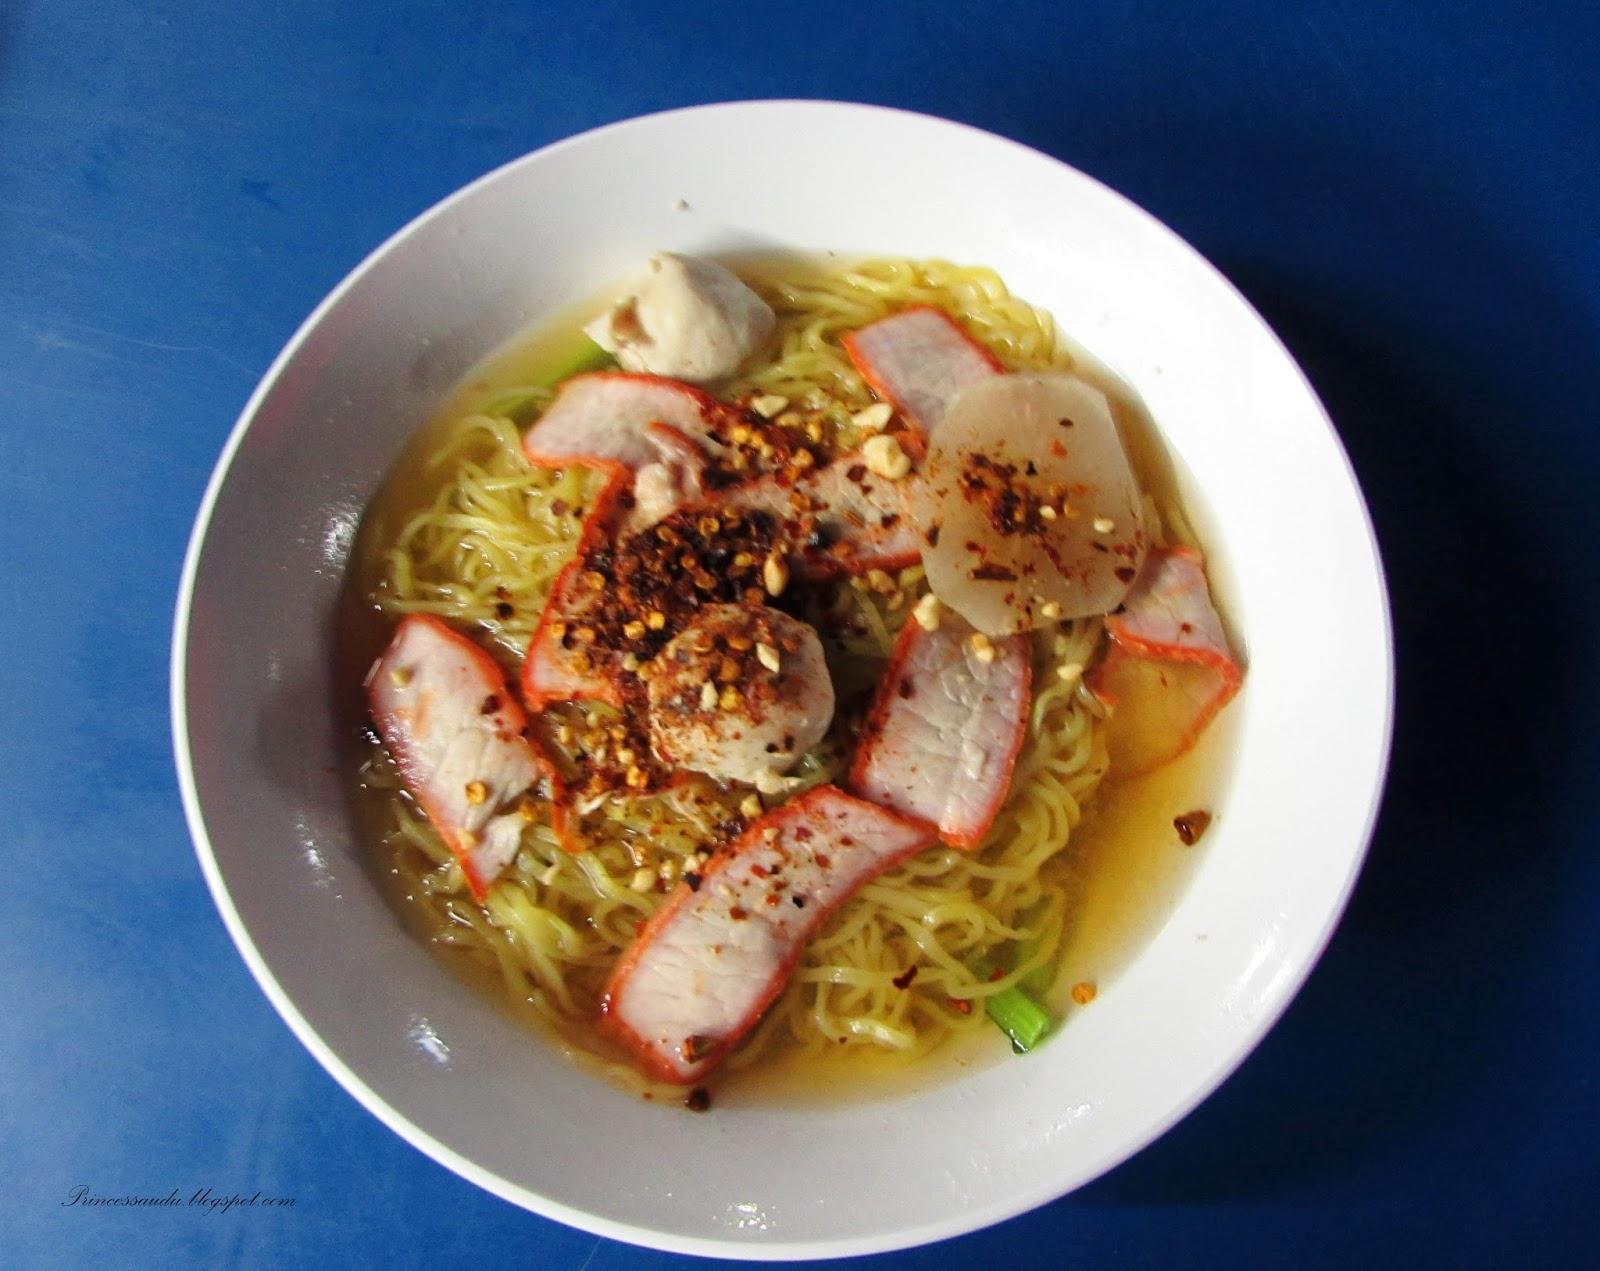 Baa Mee Moo Deng (Red Beef Egg Noodle), Thai food , street food